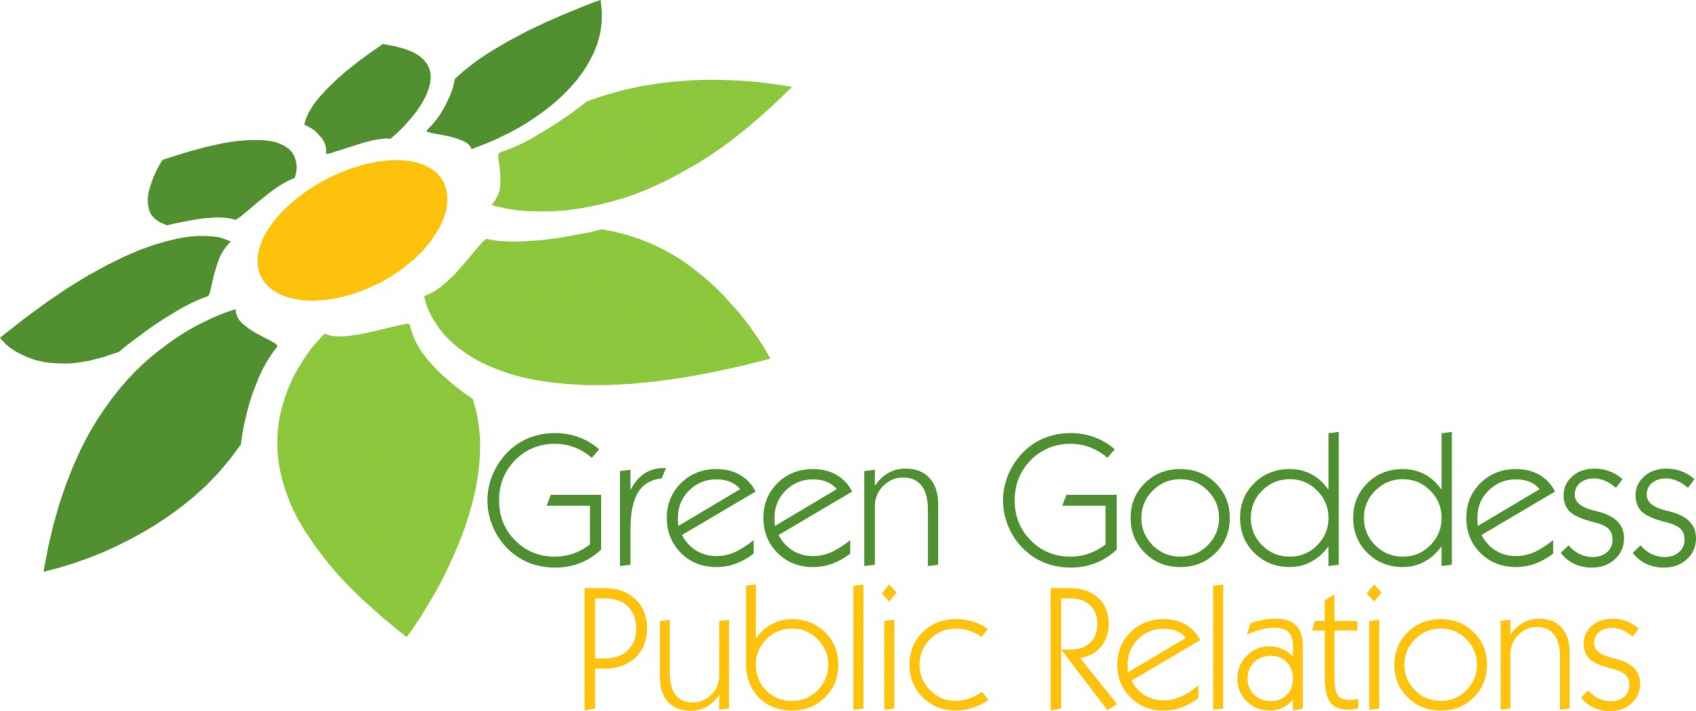 Green Goddess Public Relations Logo